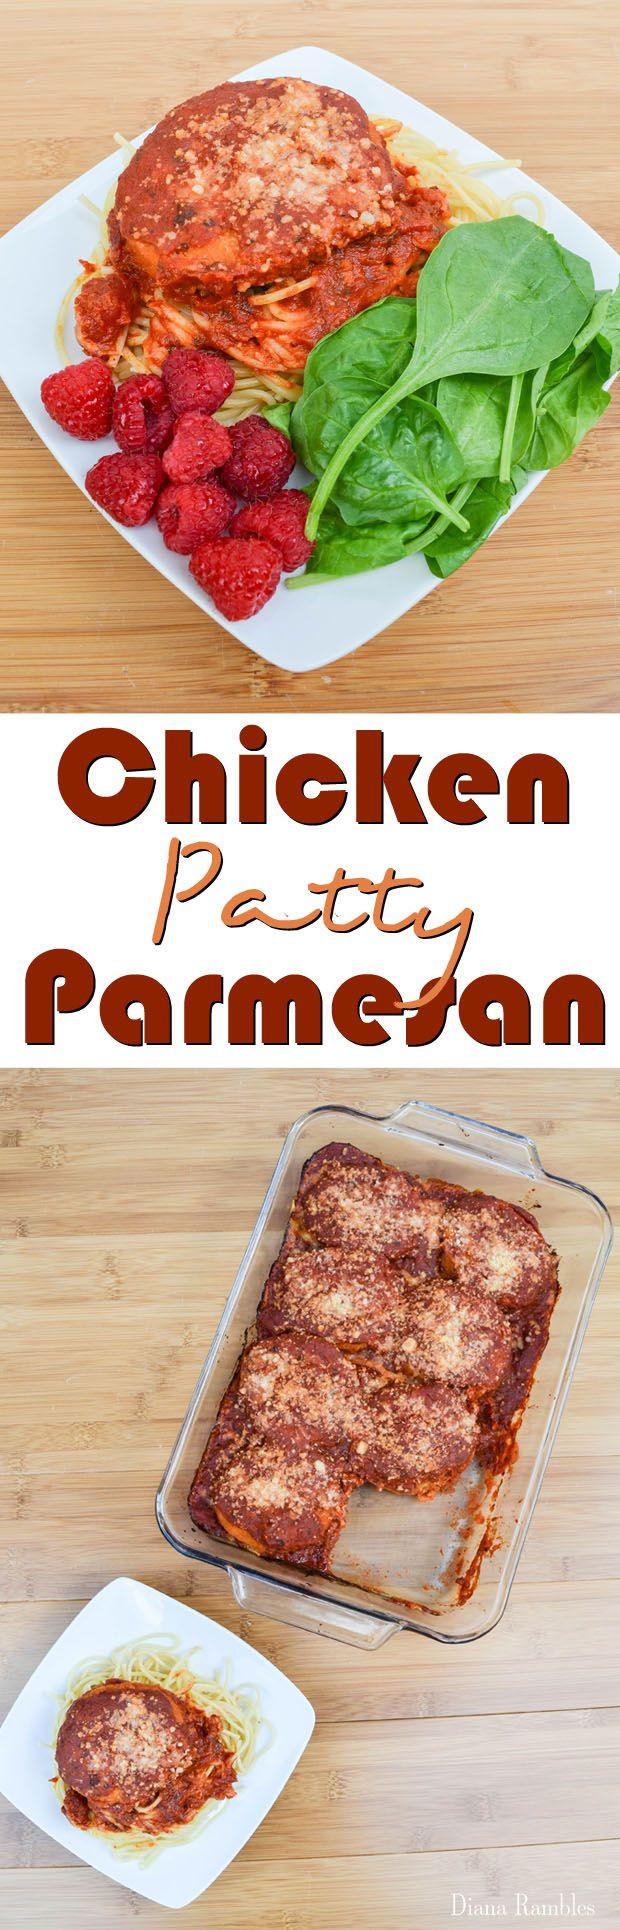 Frozen Chicken Recipes For Dinner  100 Chicken Patty Recipes on Pinterest